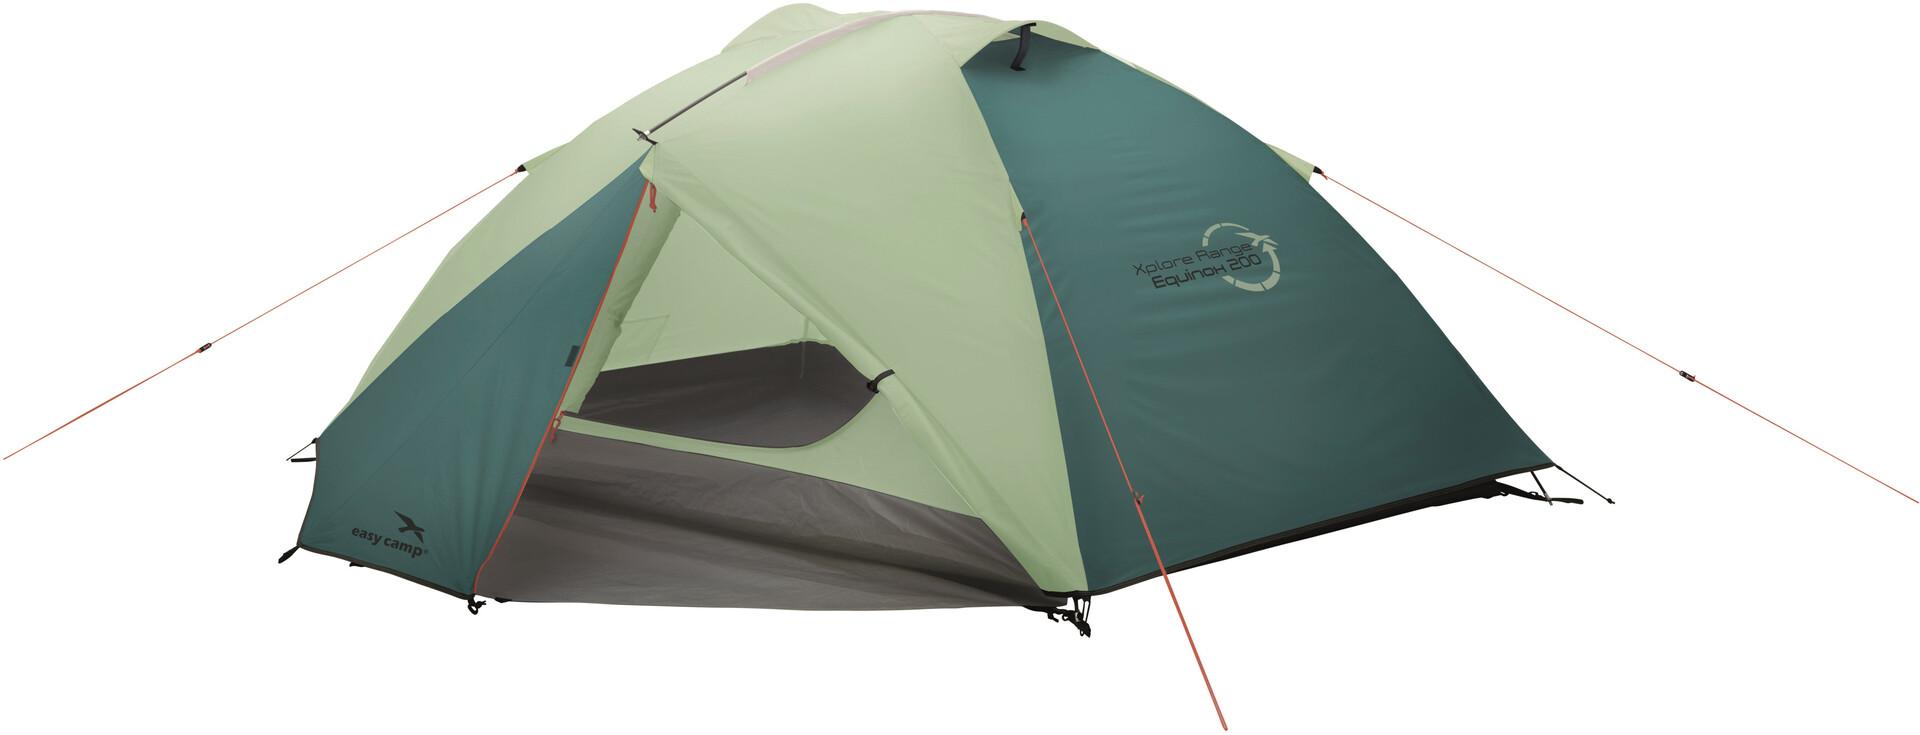 Easy Camp Equinox 200 Telt | Find outdoortøj, sko & udstyr